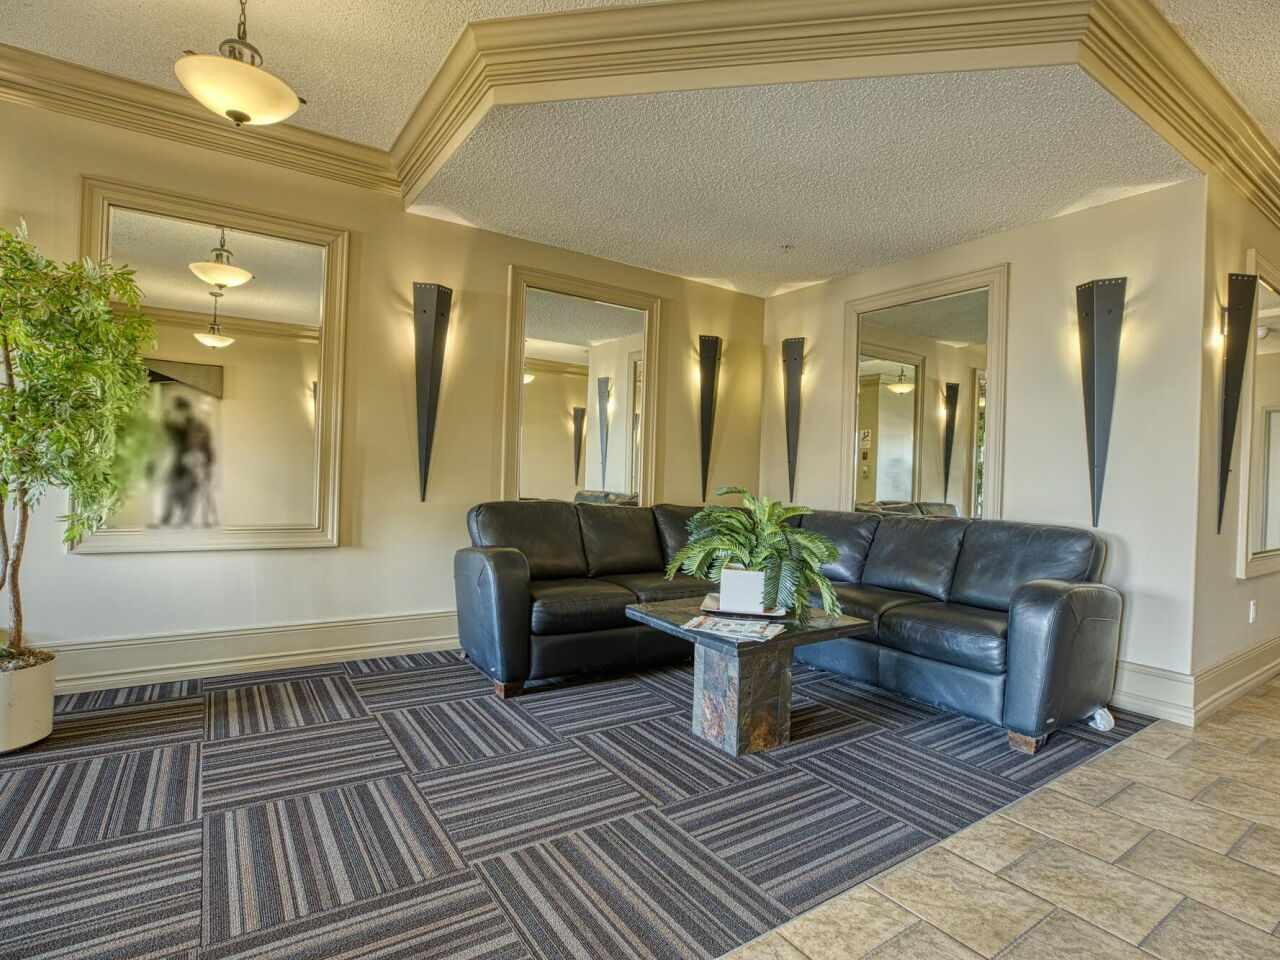 429 16807 100 Avenue - Glenwood_EDMO Lowrise Apartment for sale, 2 Bedrooms (E4234341) #4